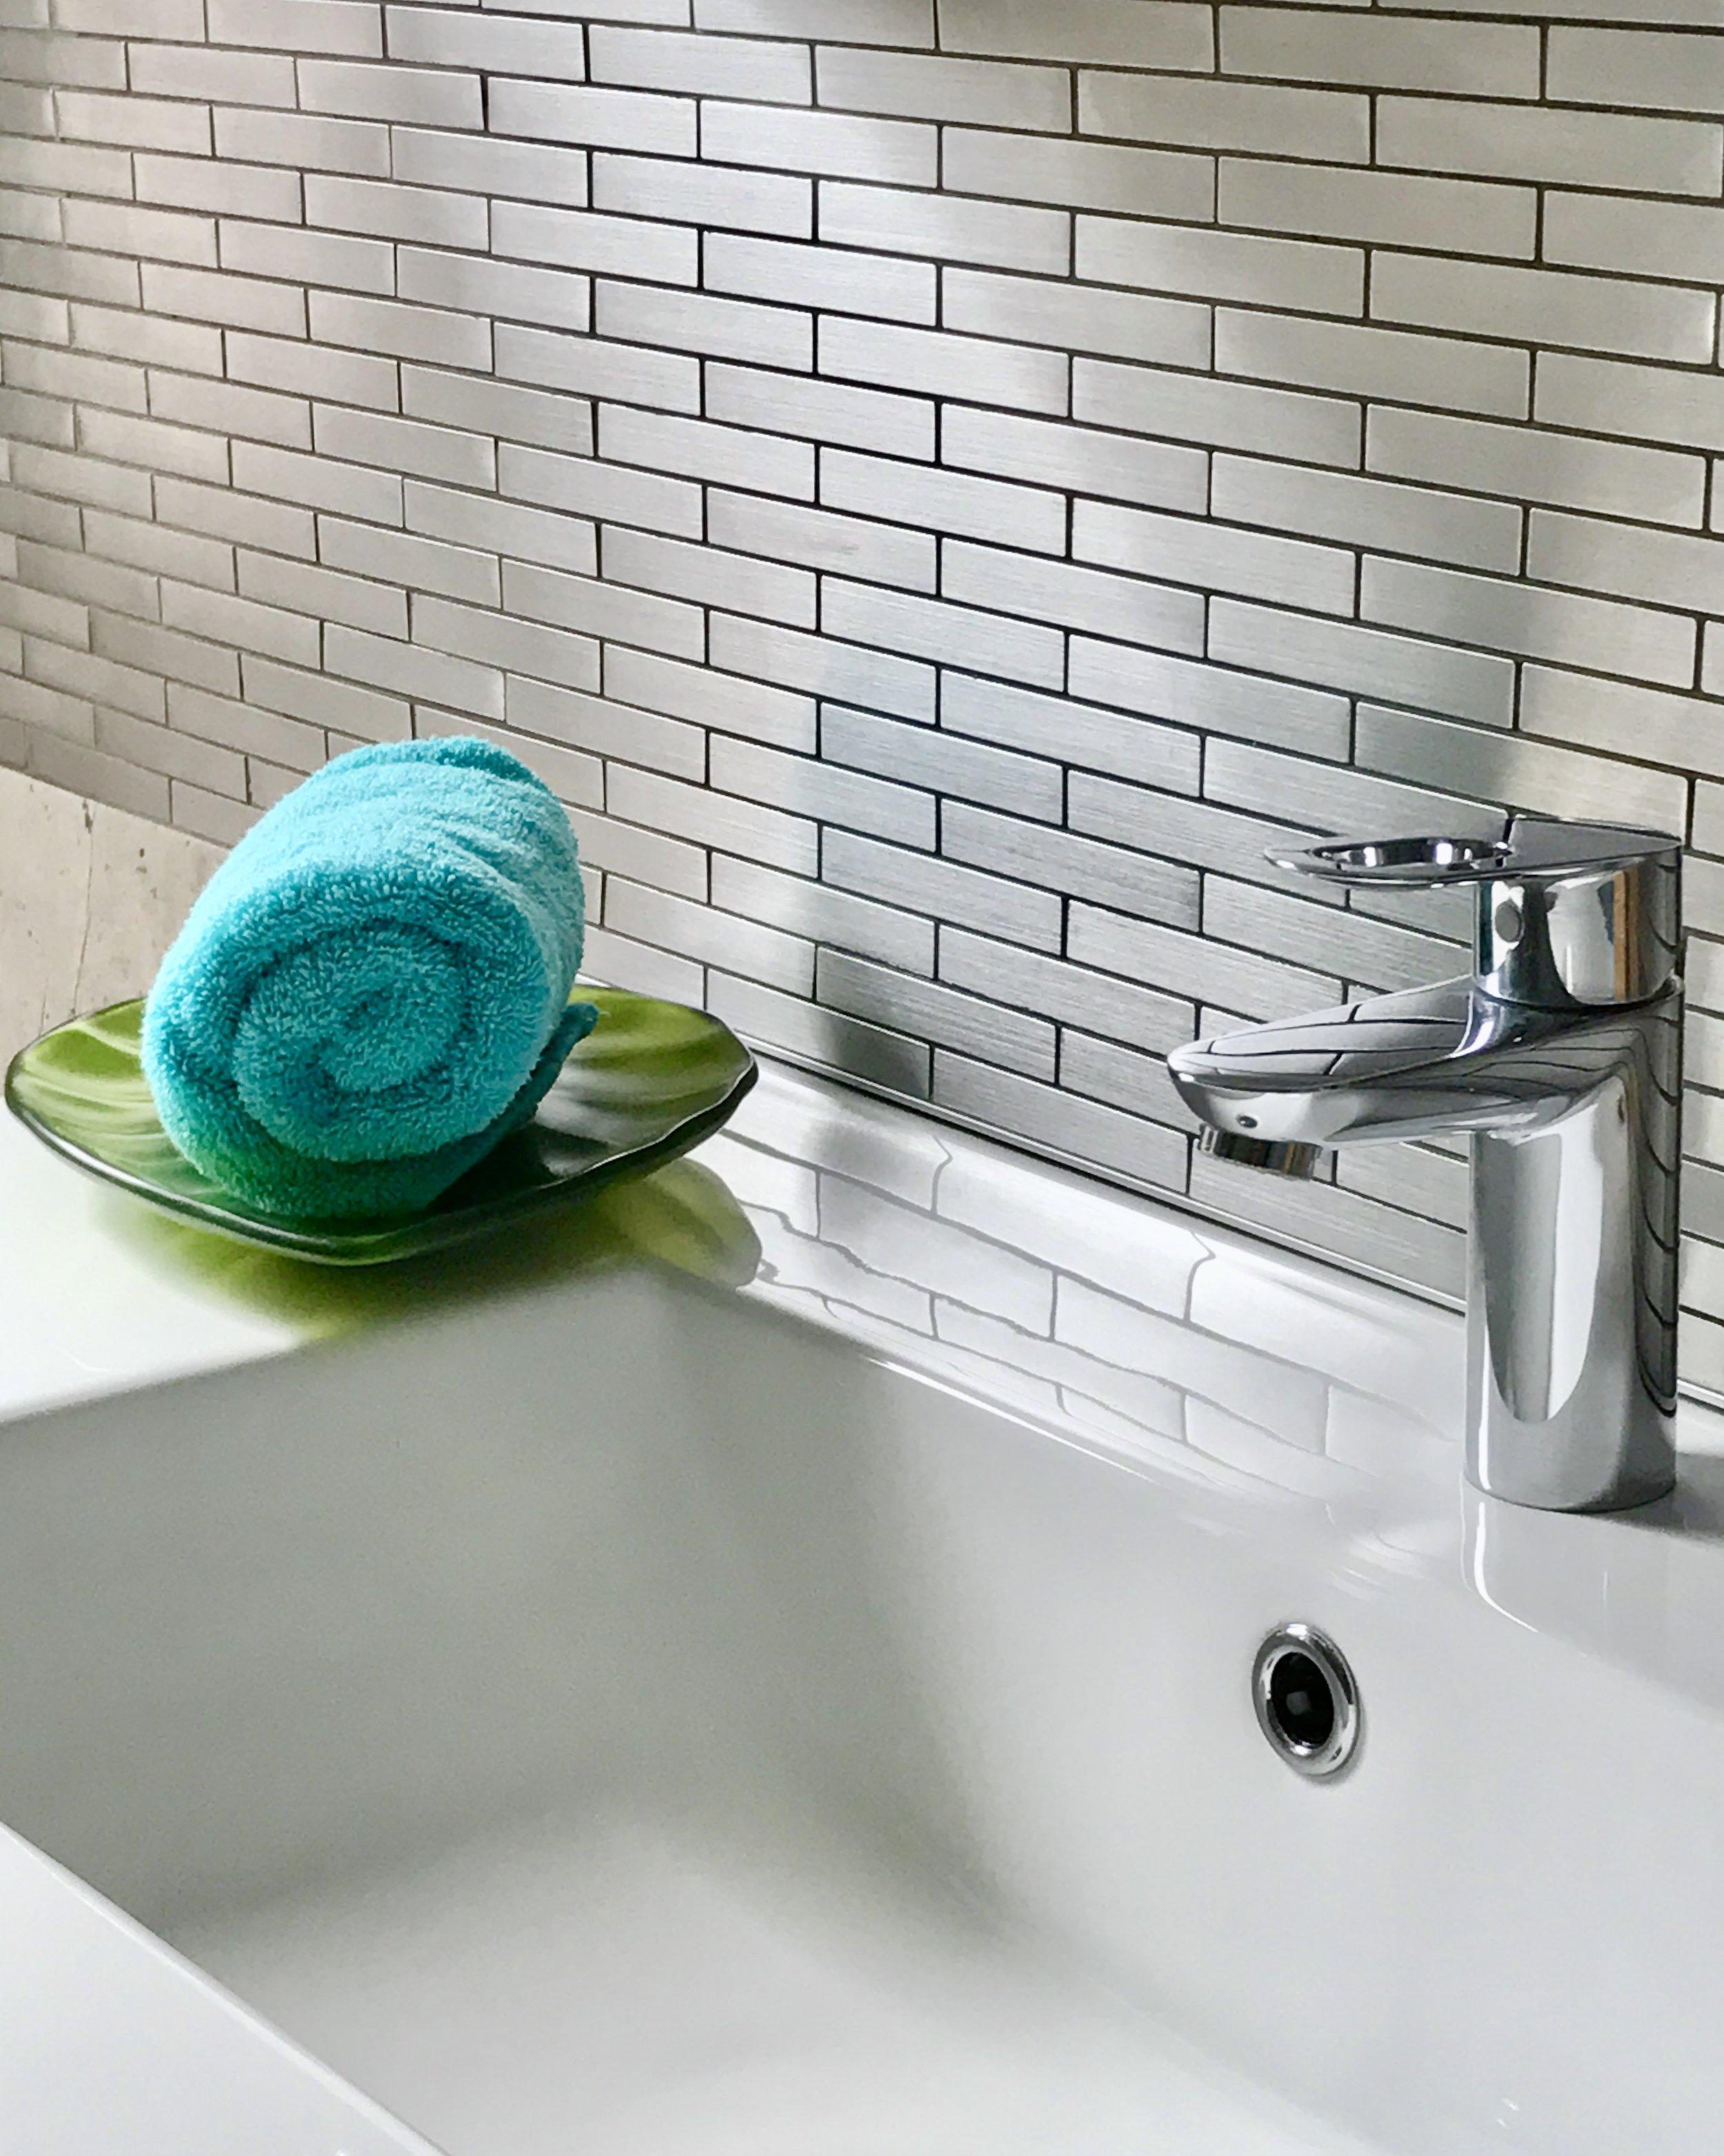 Bathroom Design-Bathroom Faucet-Bathroom Sink-Bathroom Vanity-Stainless Steel-Backsplash-Style Maven Decor Interior Design-Edmonton Canada